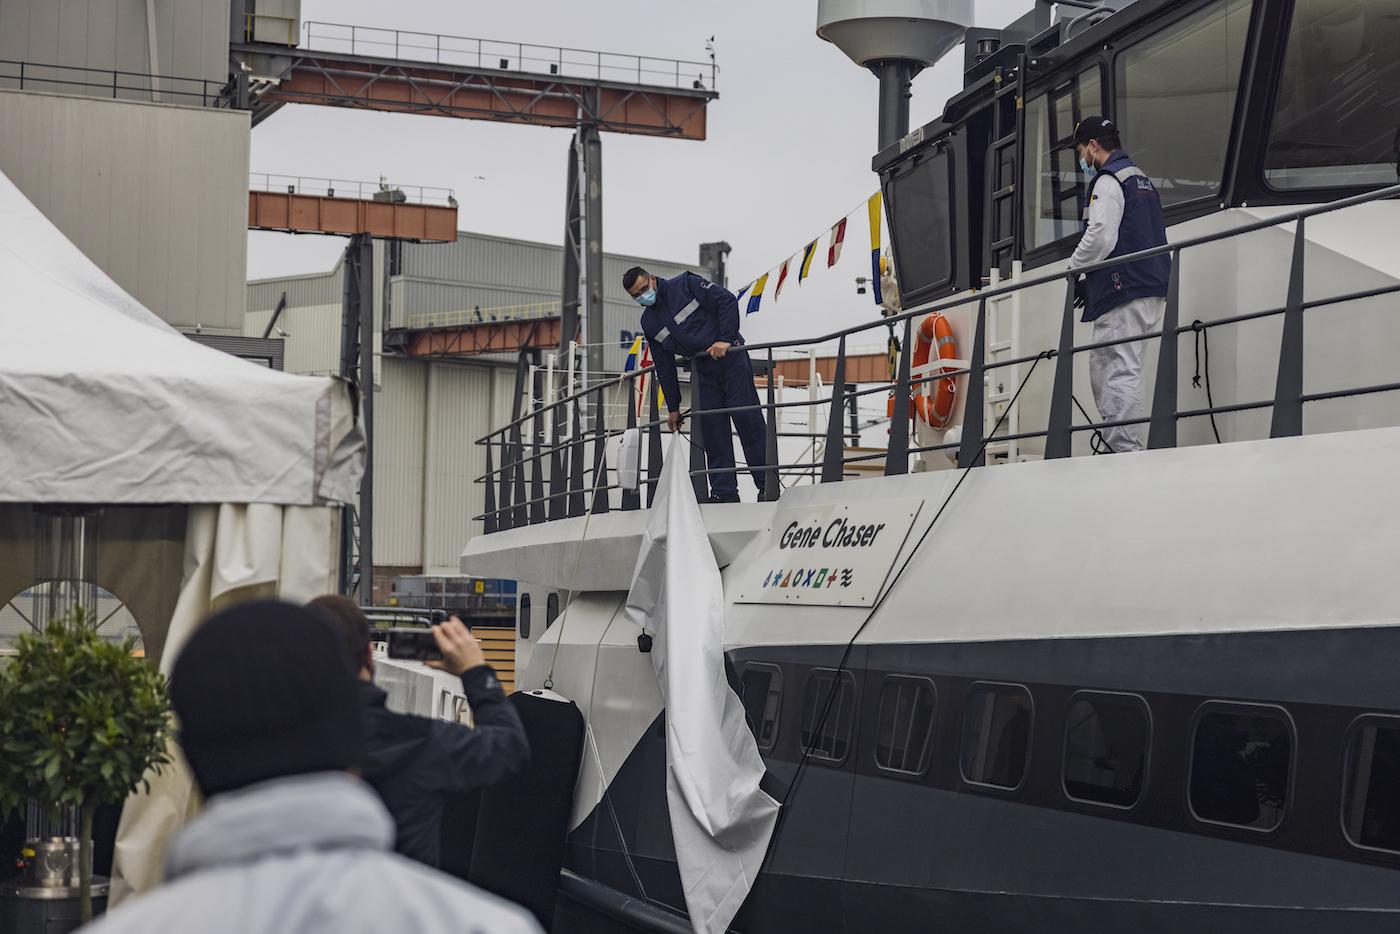 Damen Yachting - Naming Ceremony Gene Chaser yacht support